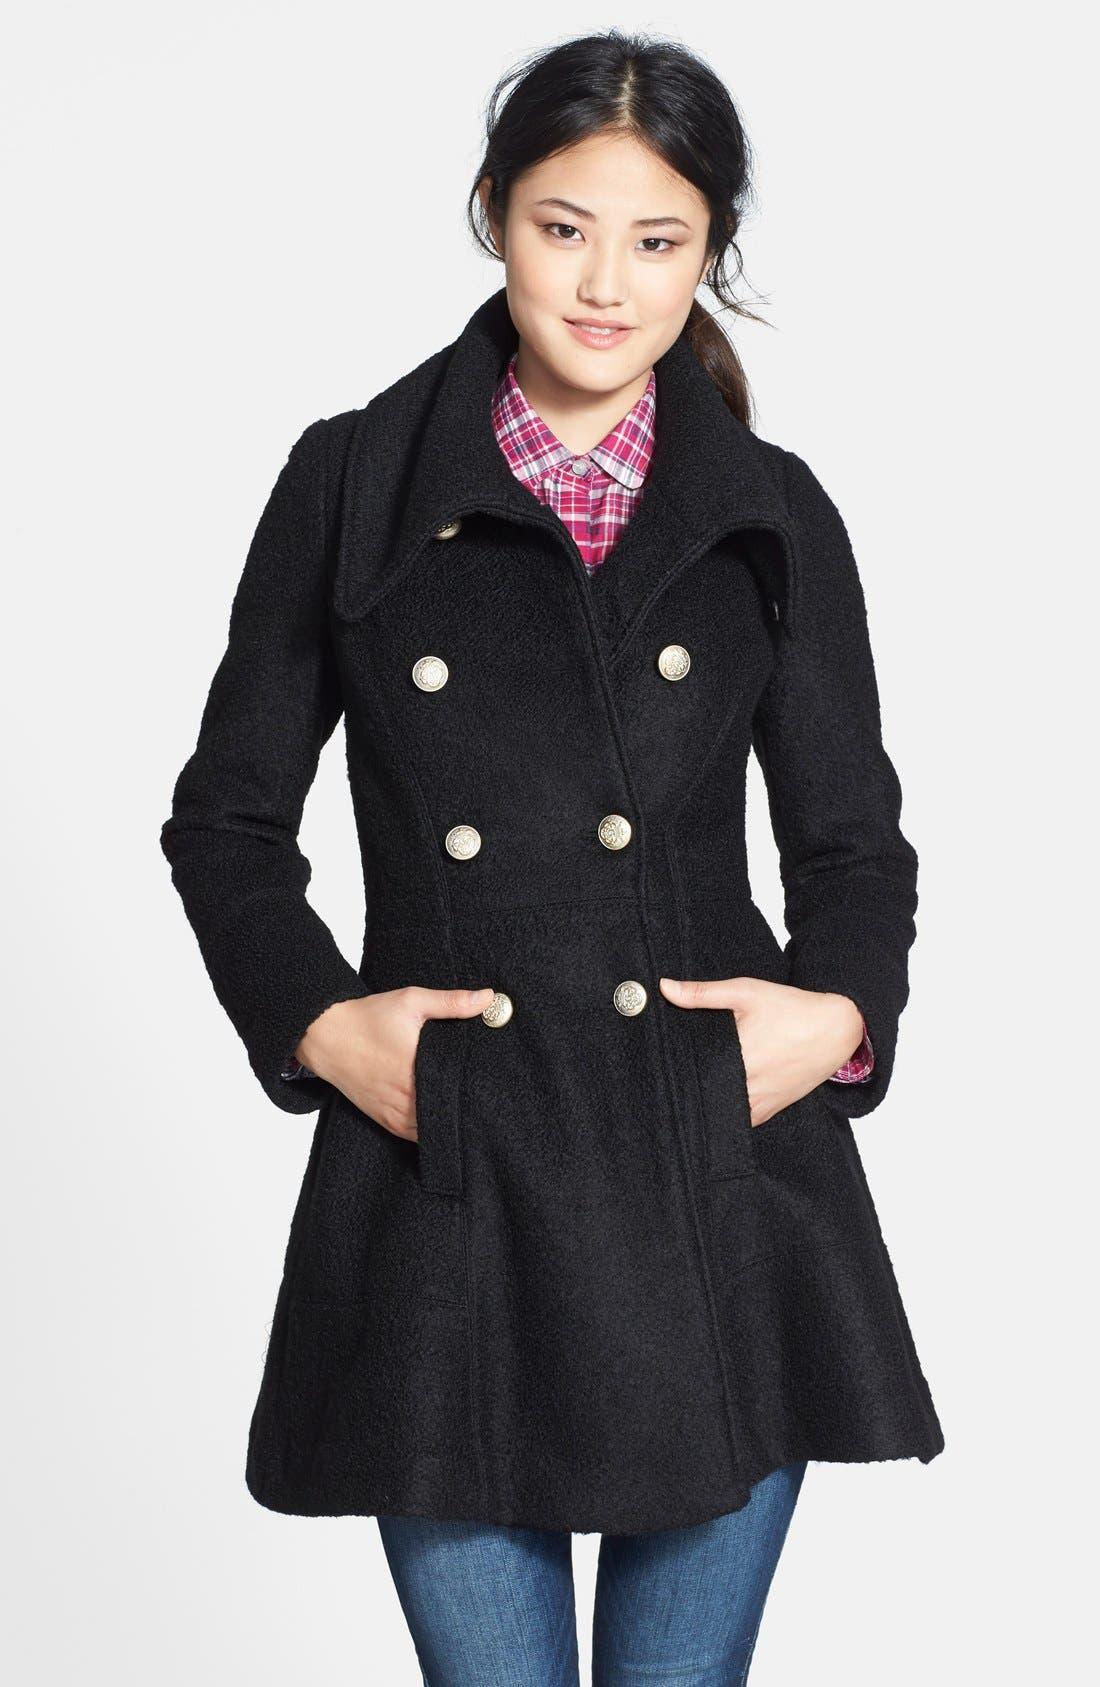 Alternate Image 1 Selected - GUESS Double Breasted Bouclé Coat (Regular & Petite)